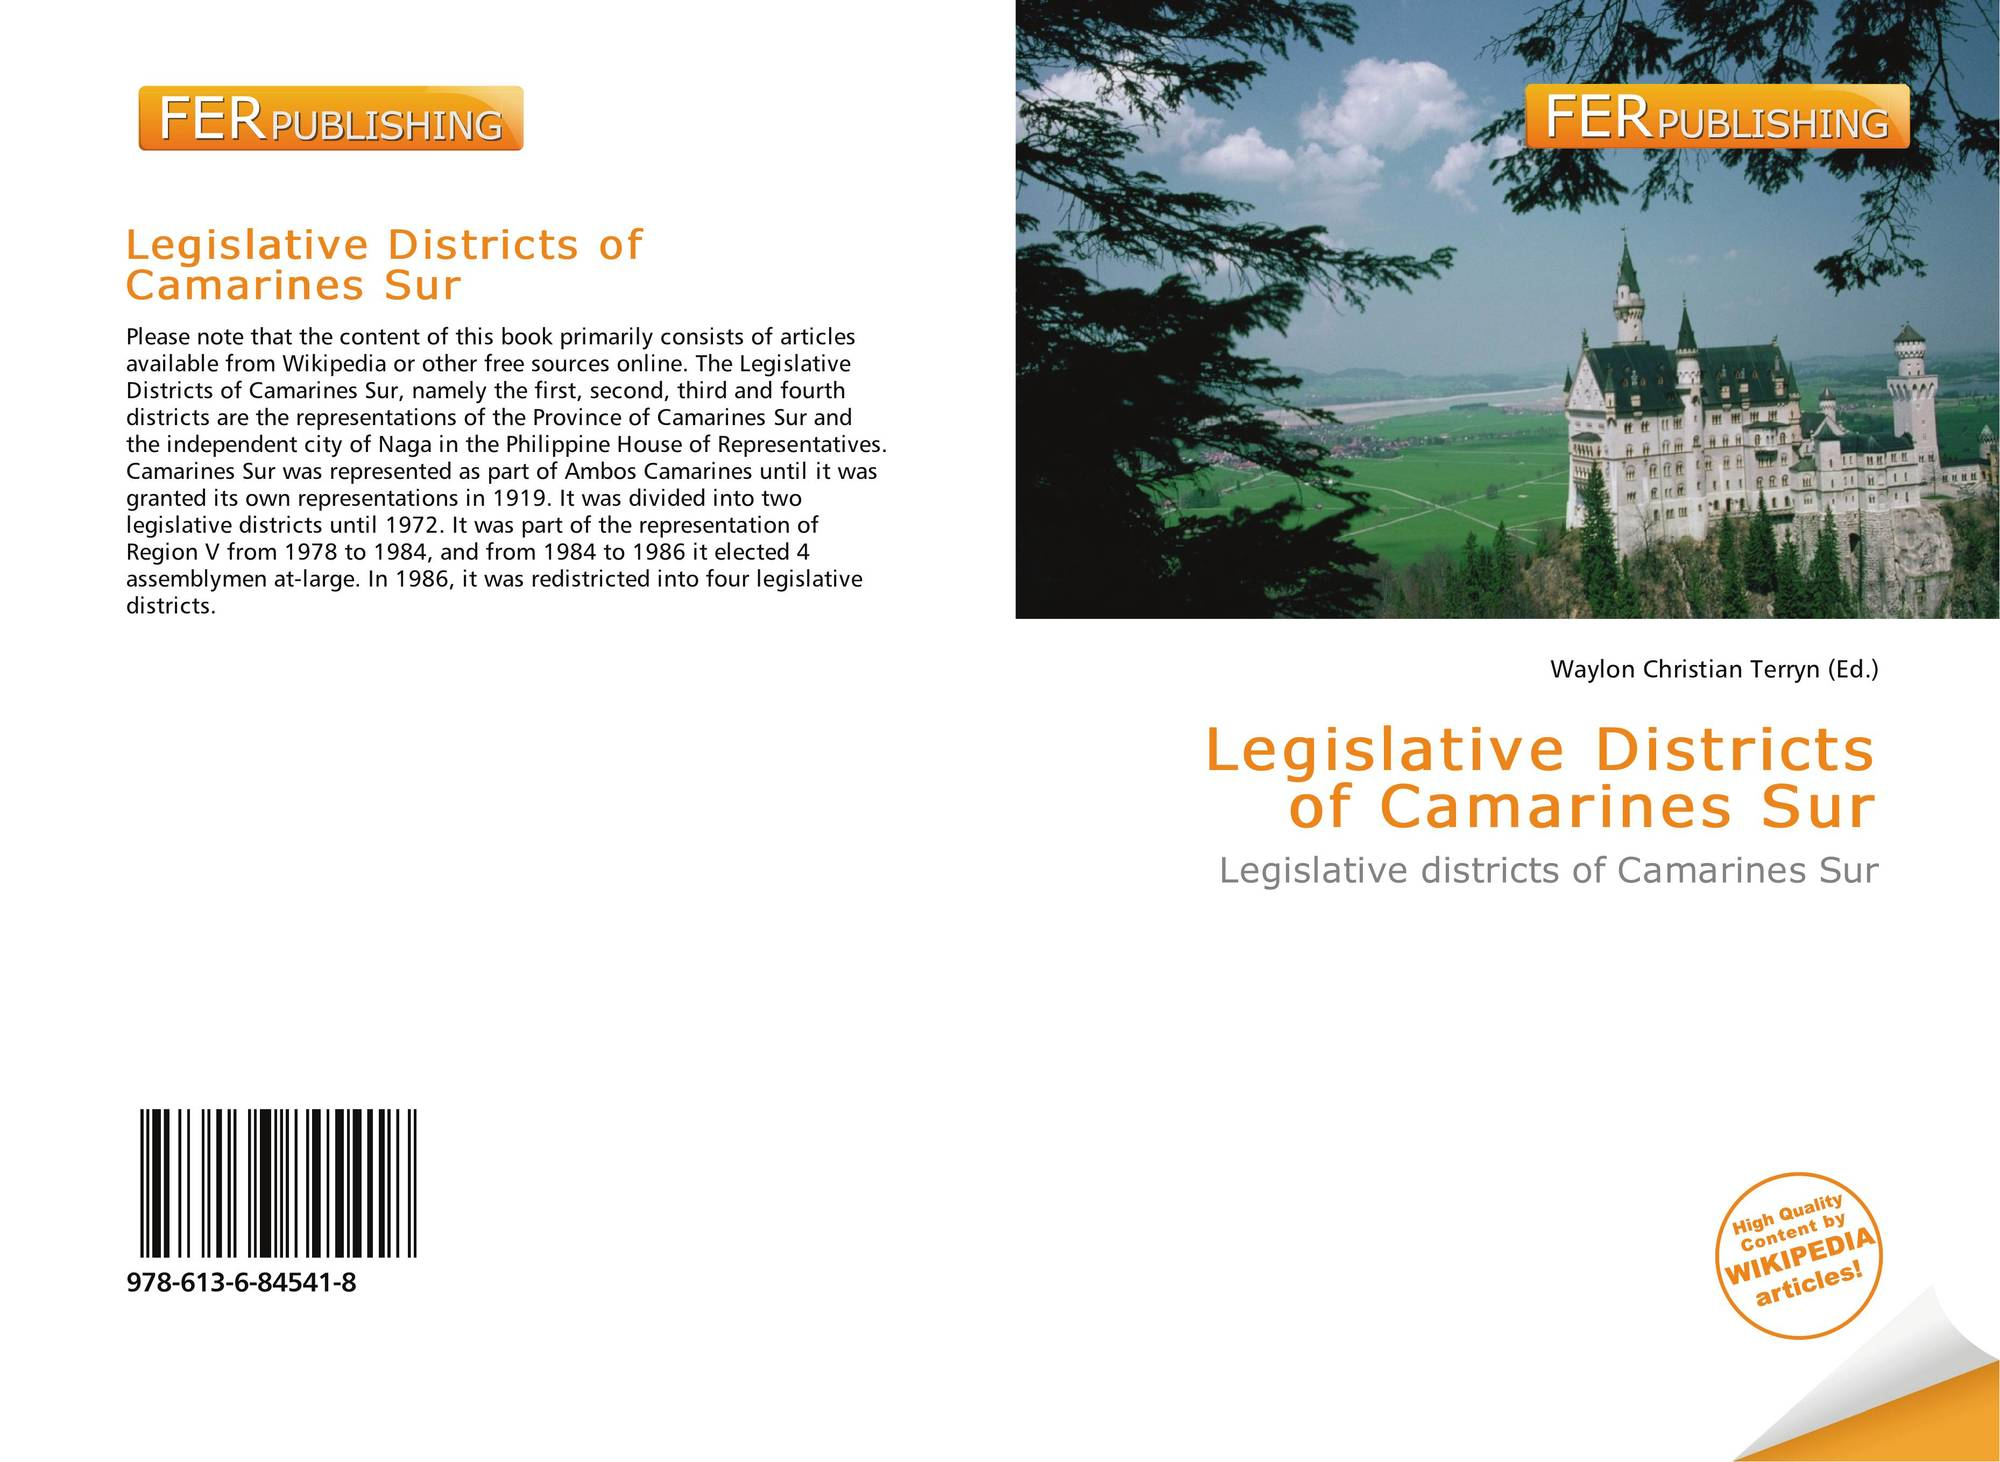 Legislative Districts of Camarines Sur, 978-613-6-84541-8